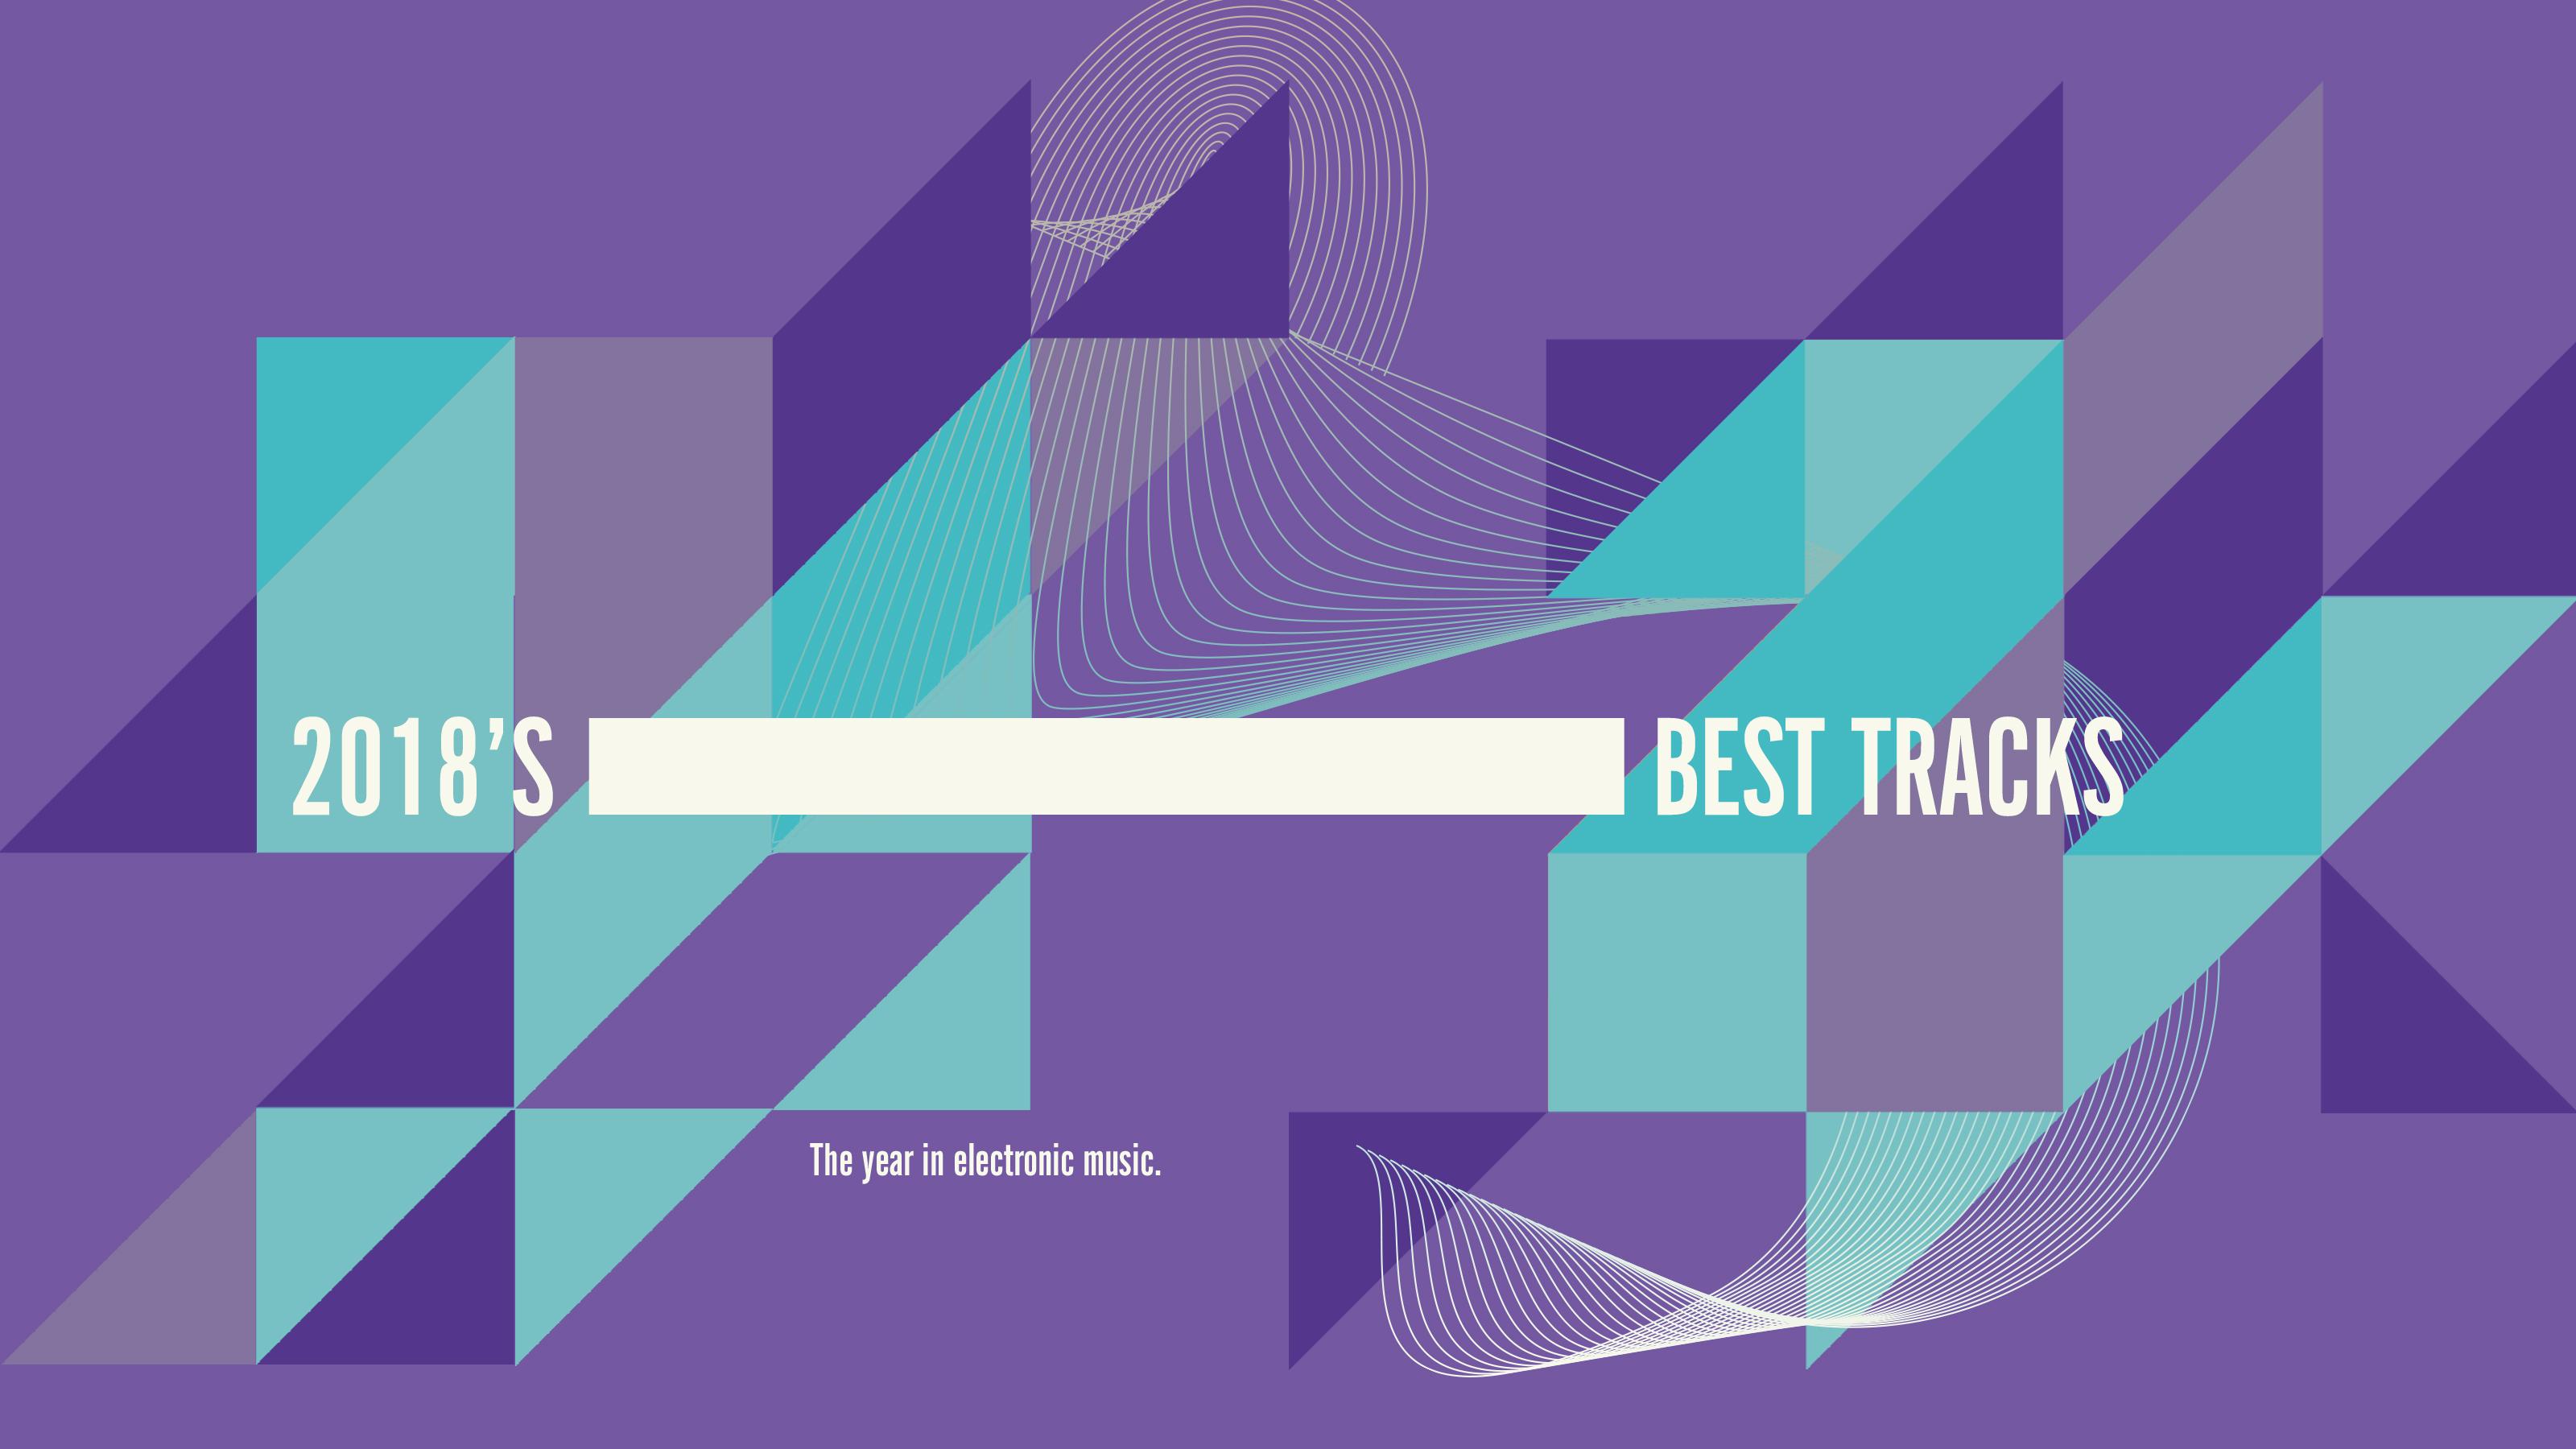 RA: 2018's Best Tracks